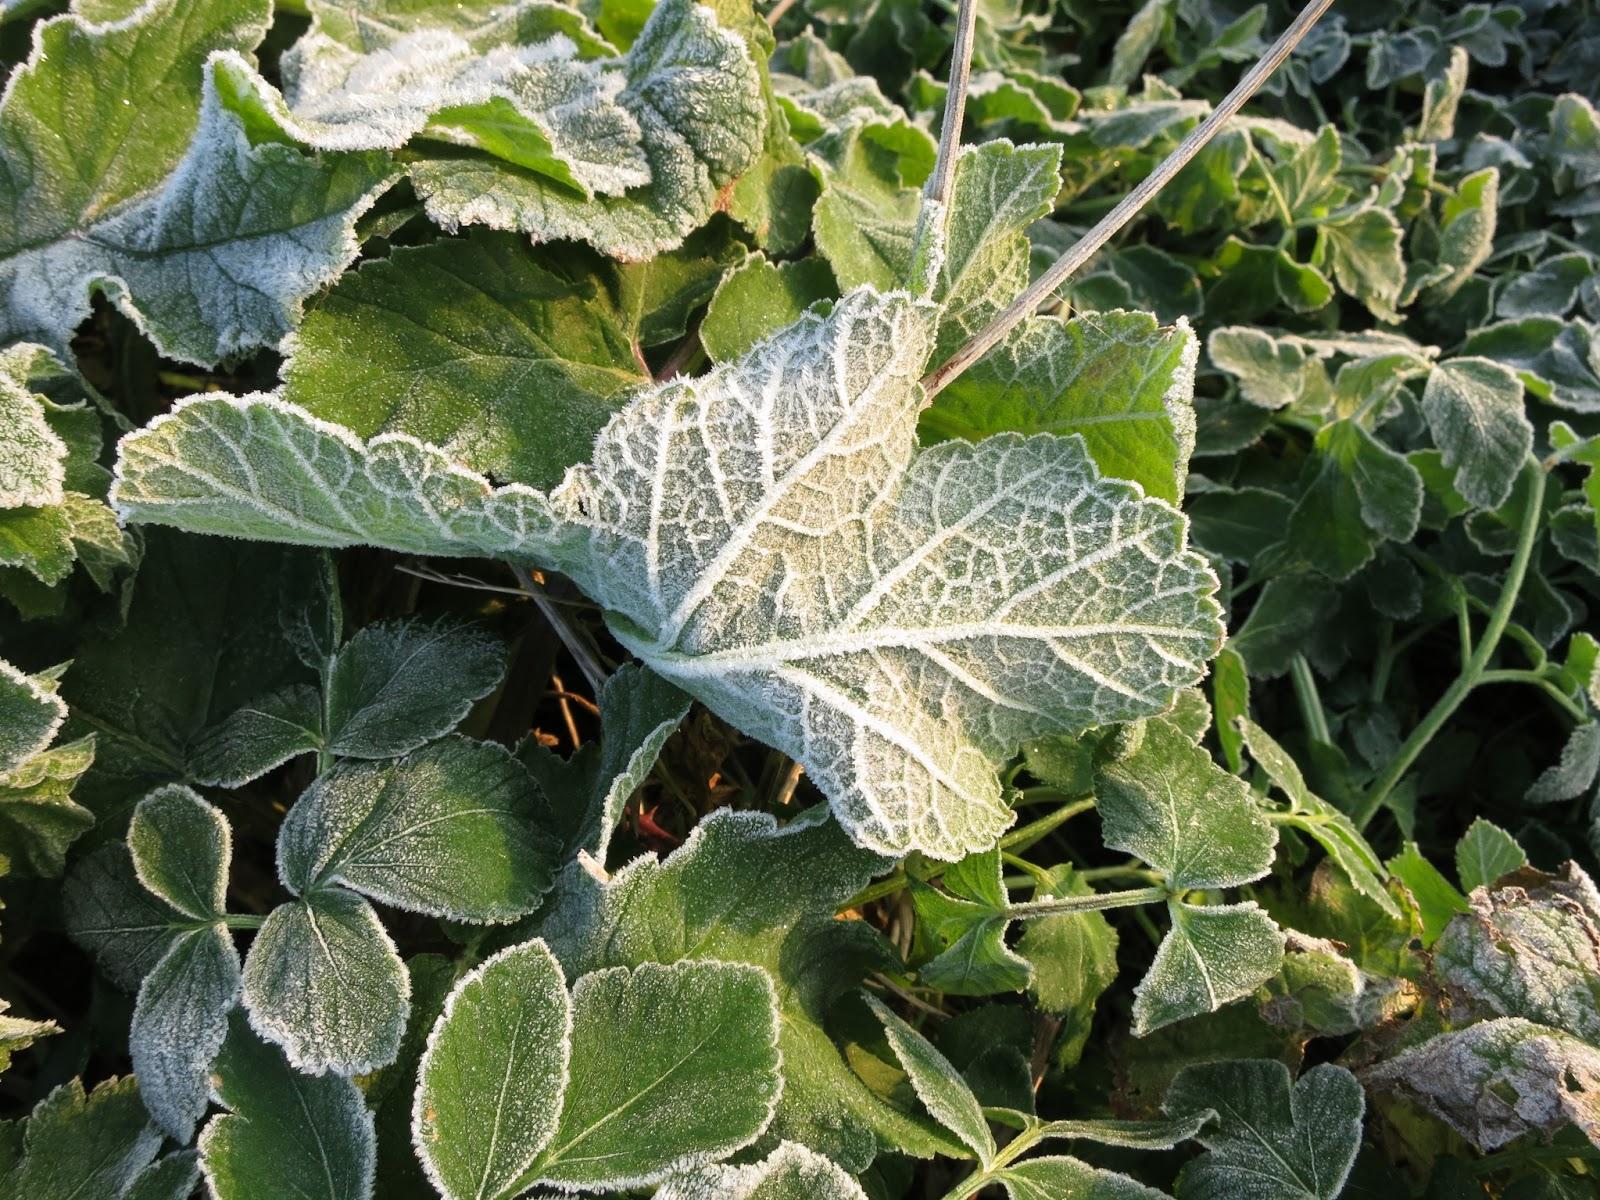 Growing leaf felled by frost.